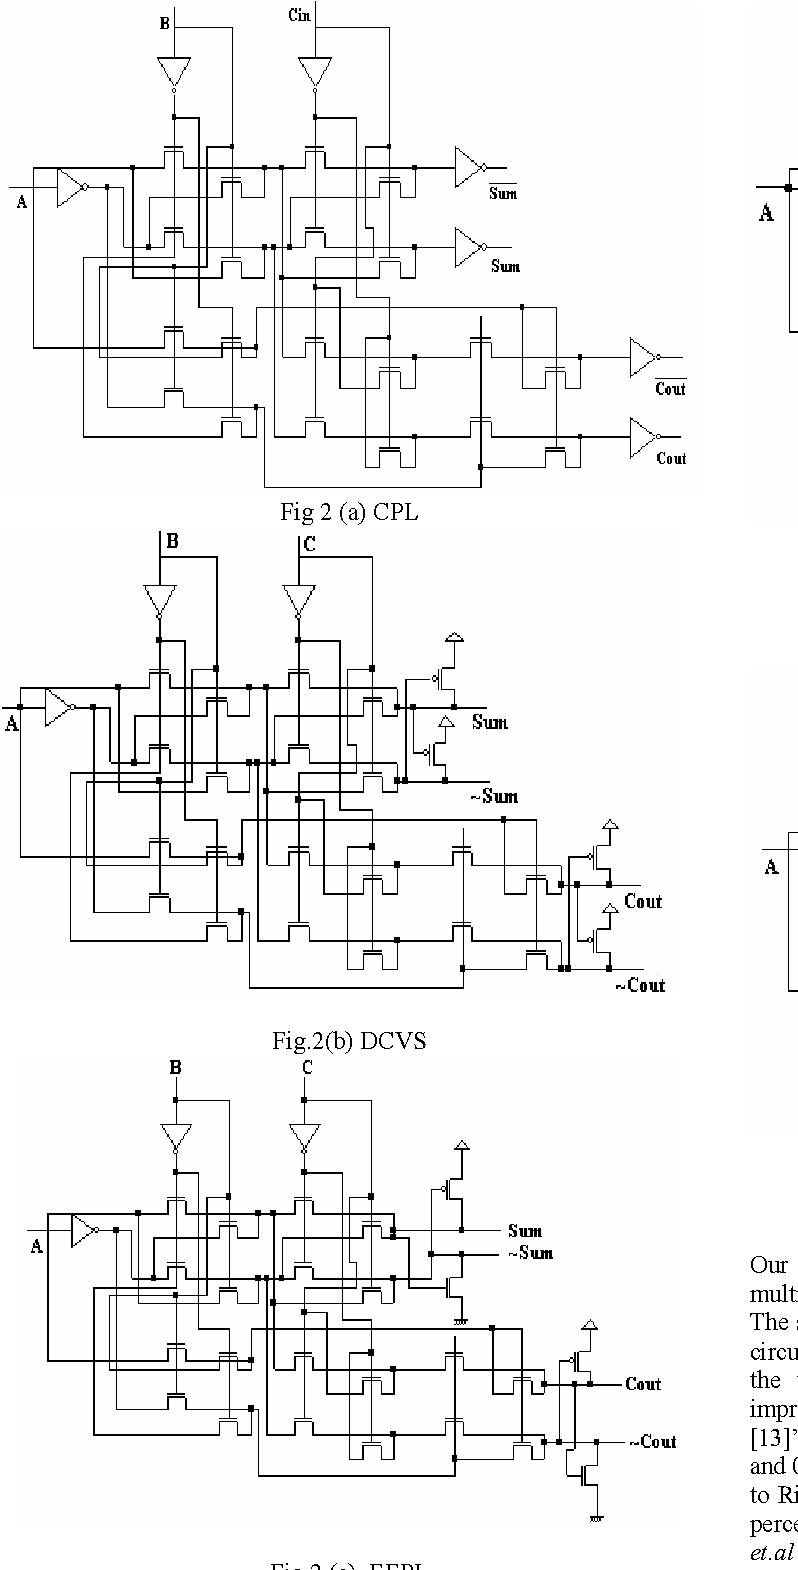 Low Power And High Speed 8x8 Bit Multiplier Using Non Clocked Pass 8 Circuit Diagram Transistor Logic Semantic Scholar